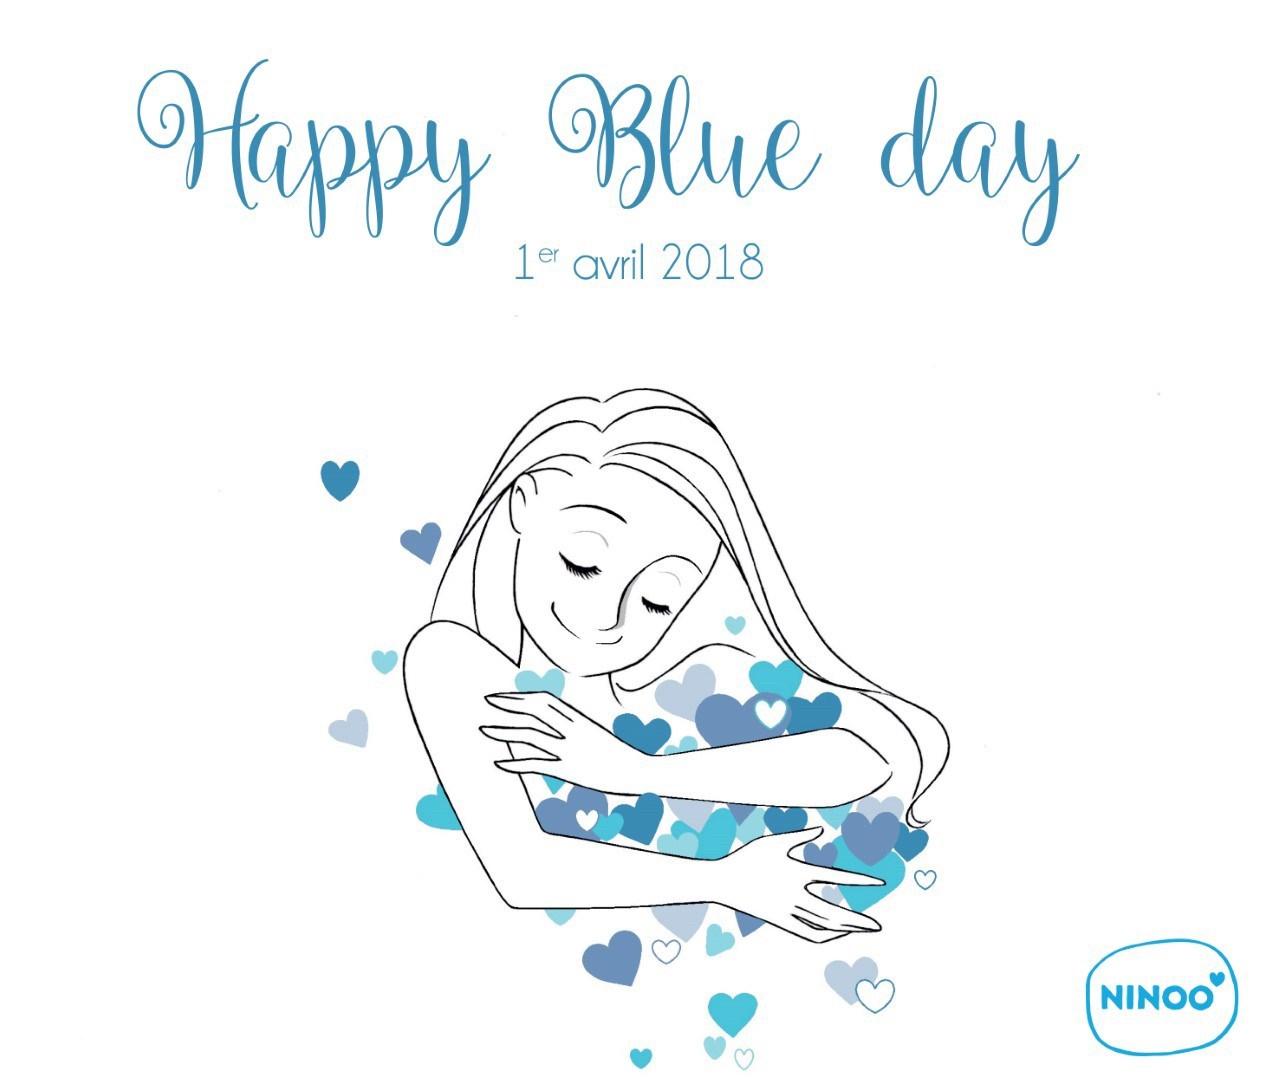 Happy Blue day